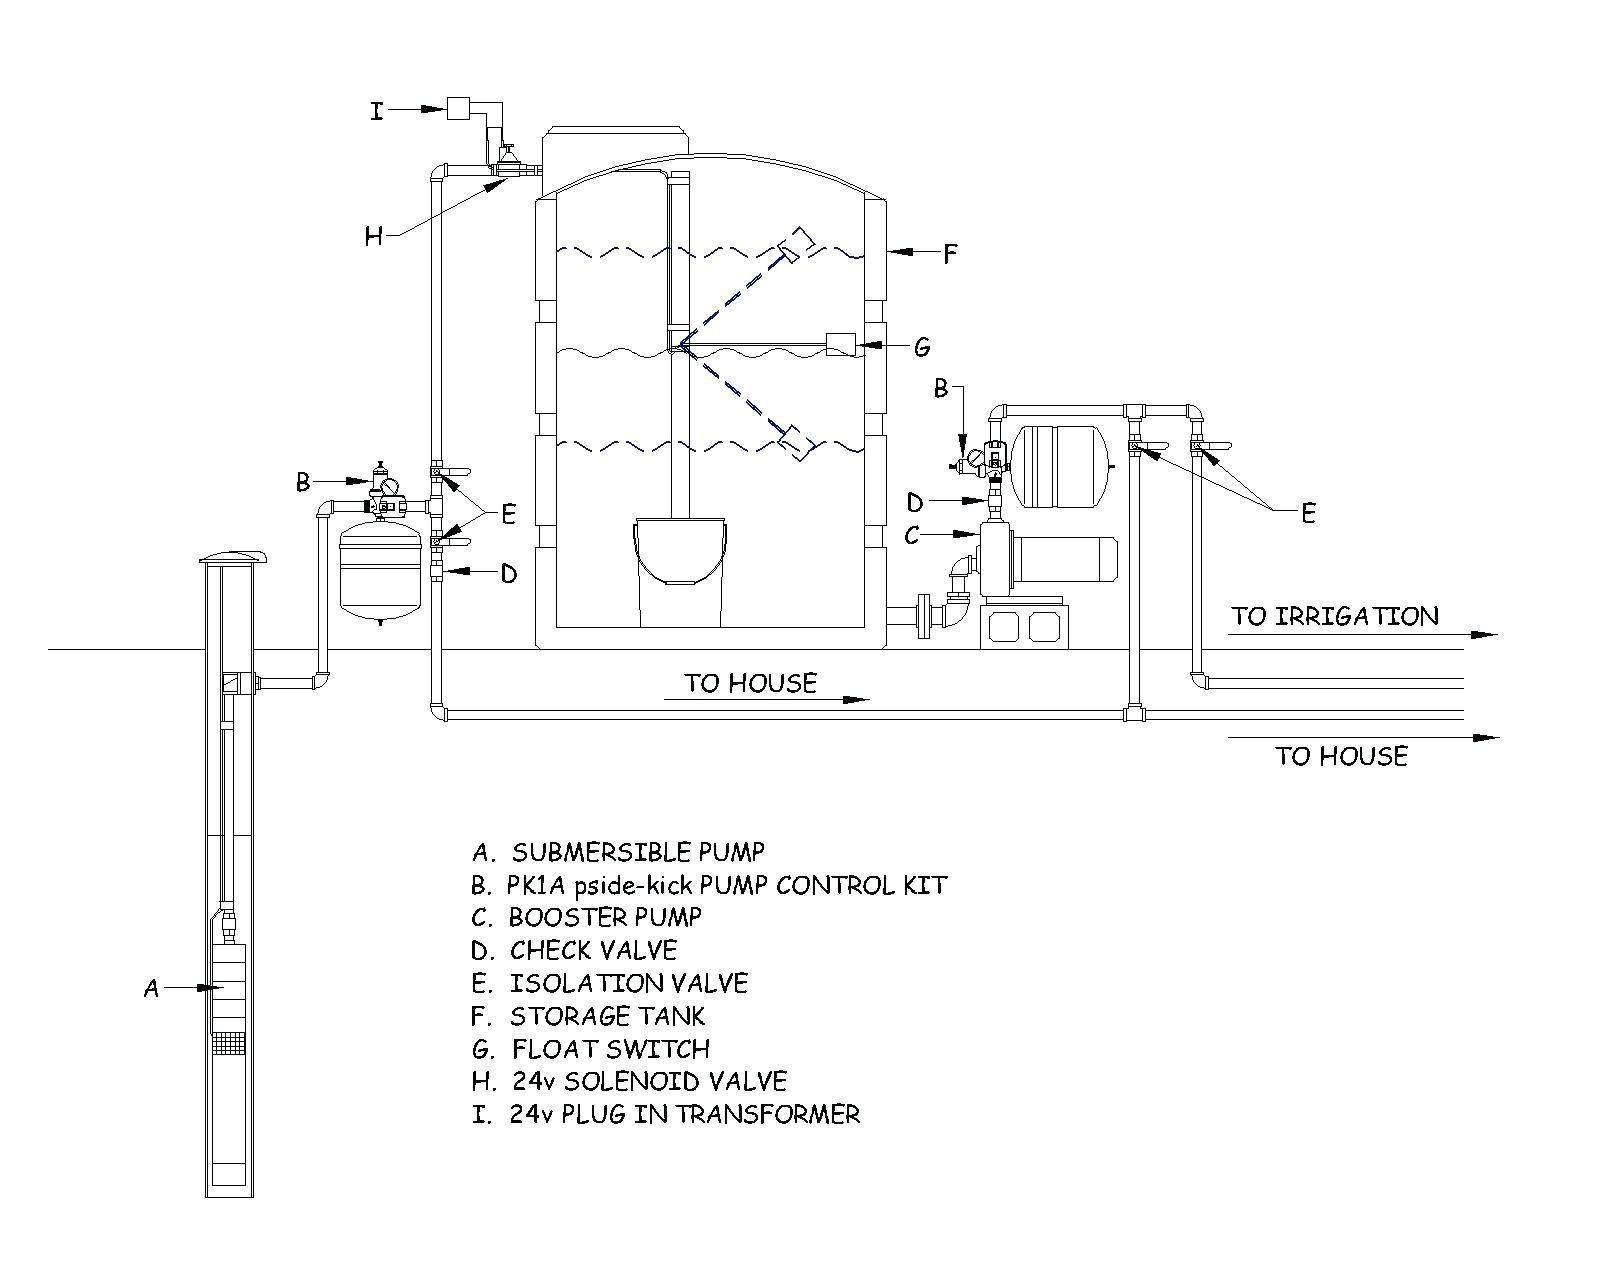 Well Pump Pressure Switch Wiring Diagram Awesome Submersible Well Pump Wiring Diagram Channel Time Delay Remote